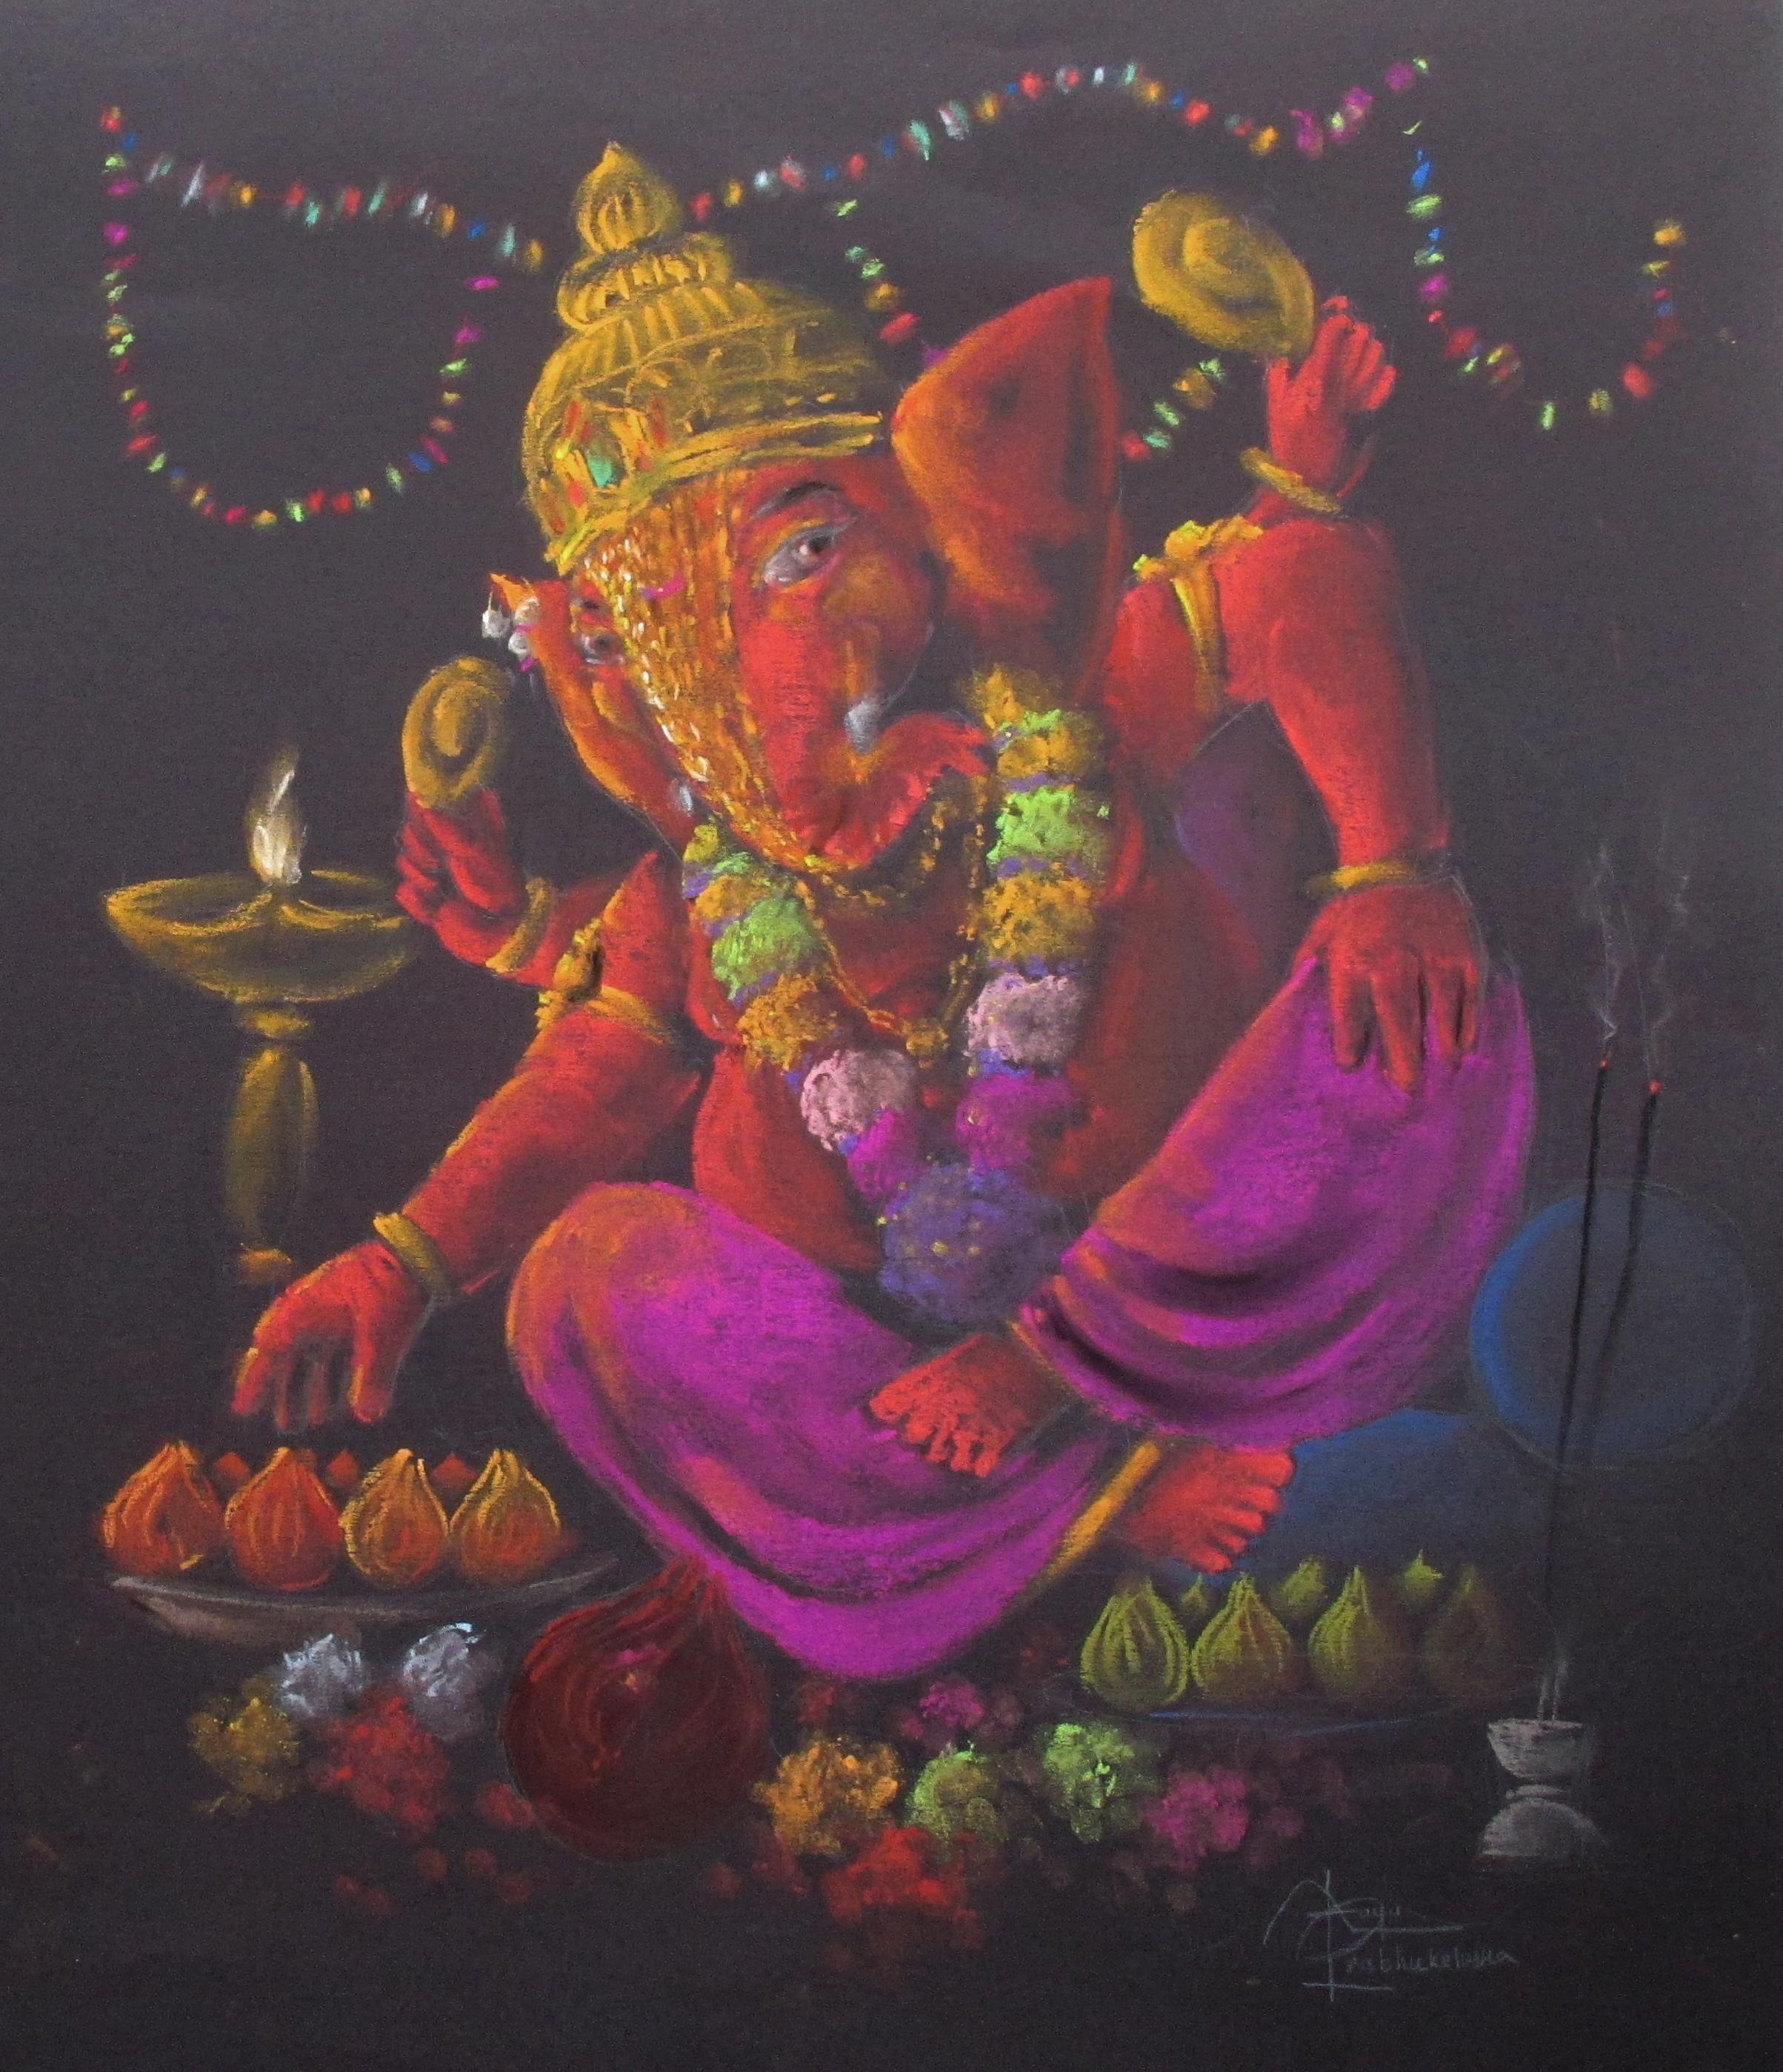 Aarya Prabhukeluskar-- Grand Prize Winner